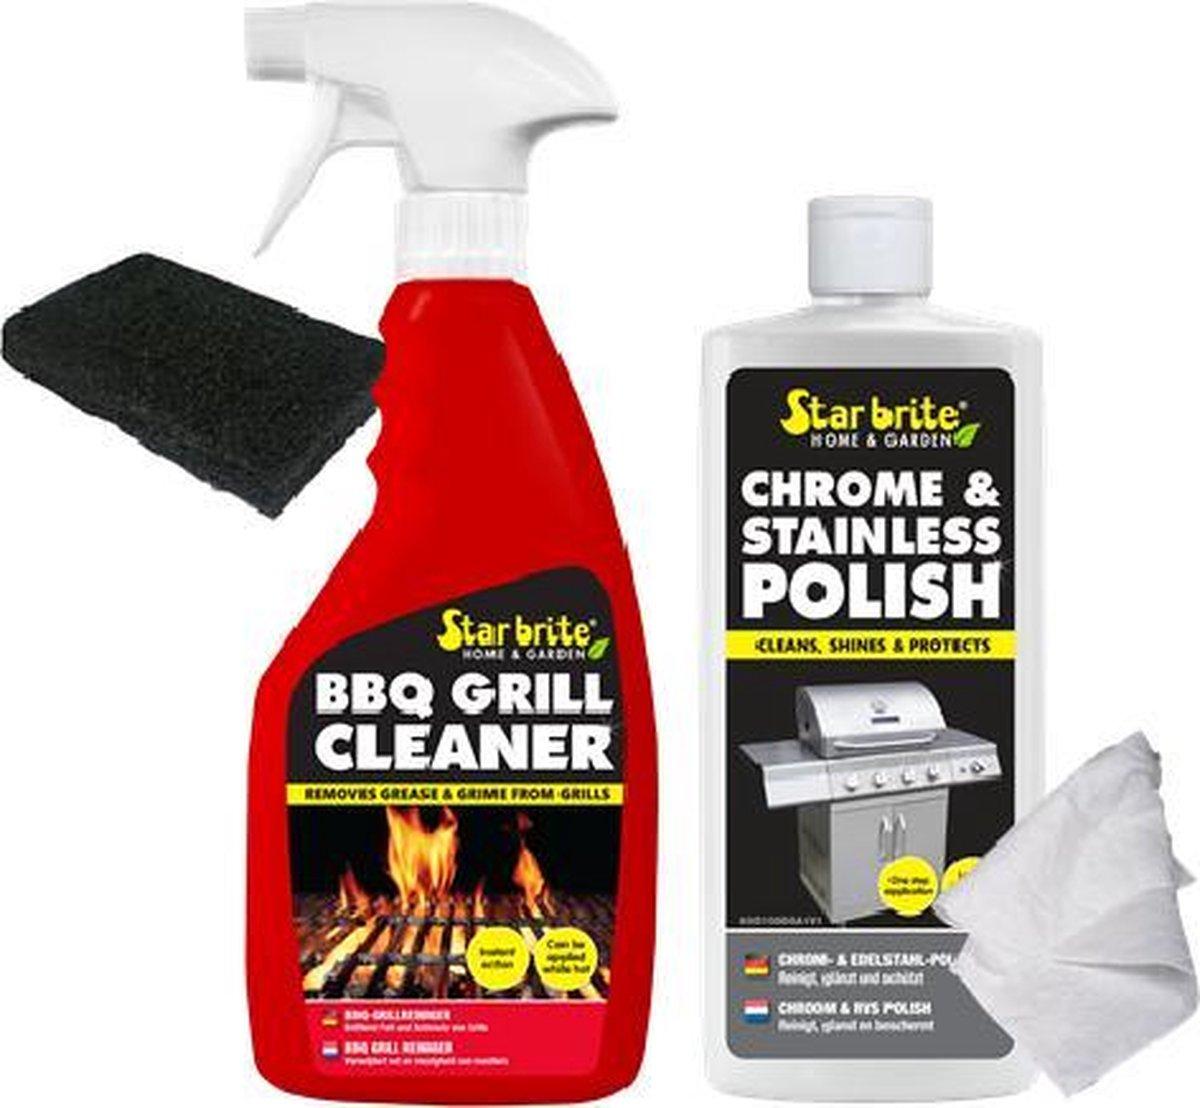 Starbrite BBQ Barbecue / Grill Reiniger | Premium SET 4-delig